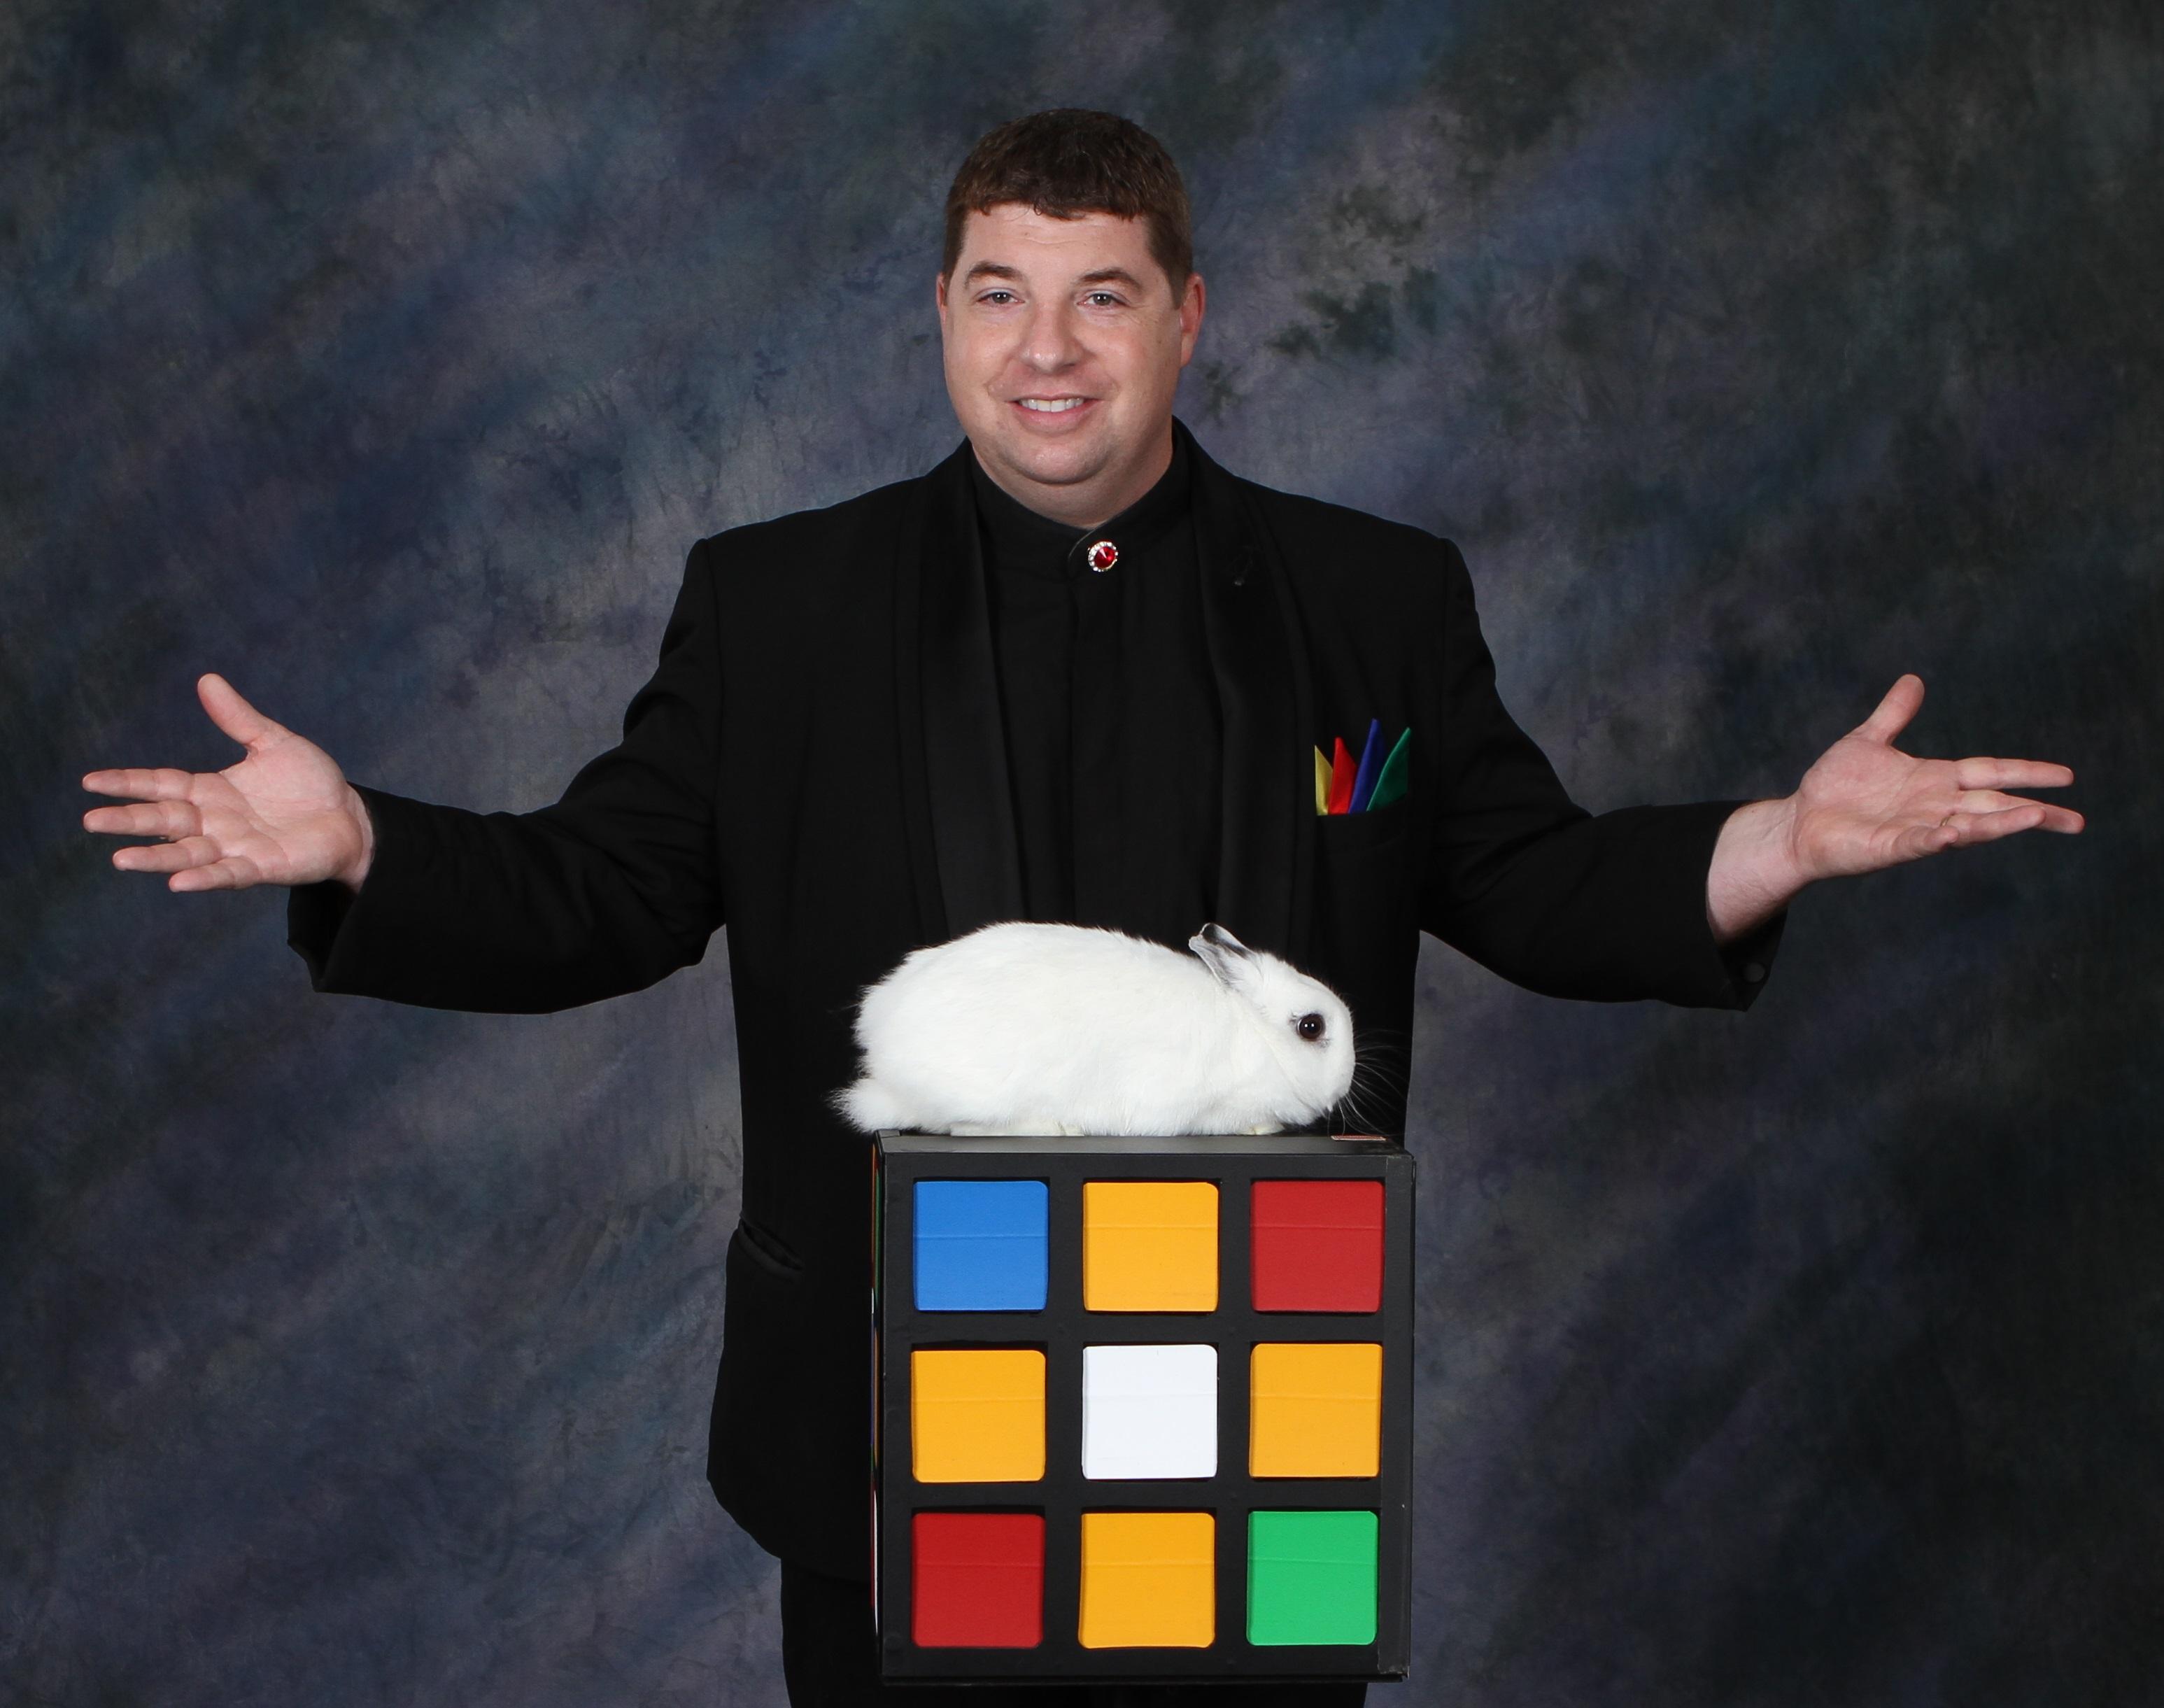 joseph young christian illusionist with rabbit magic trick